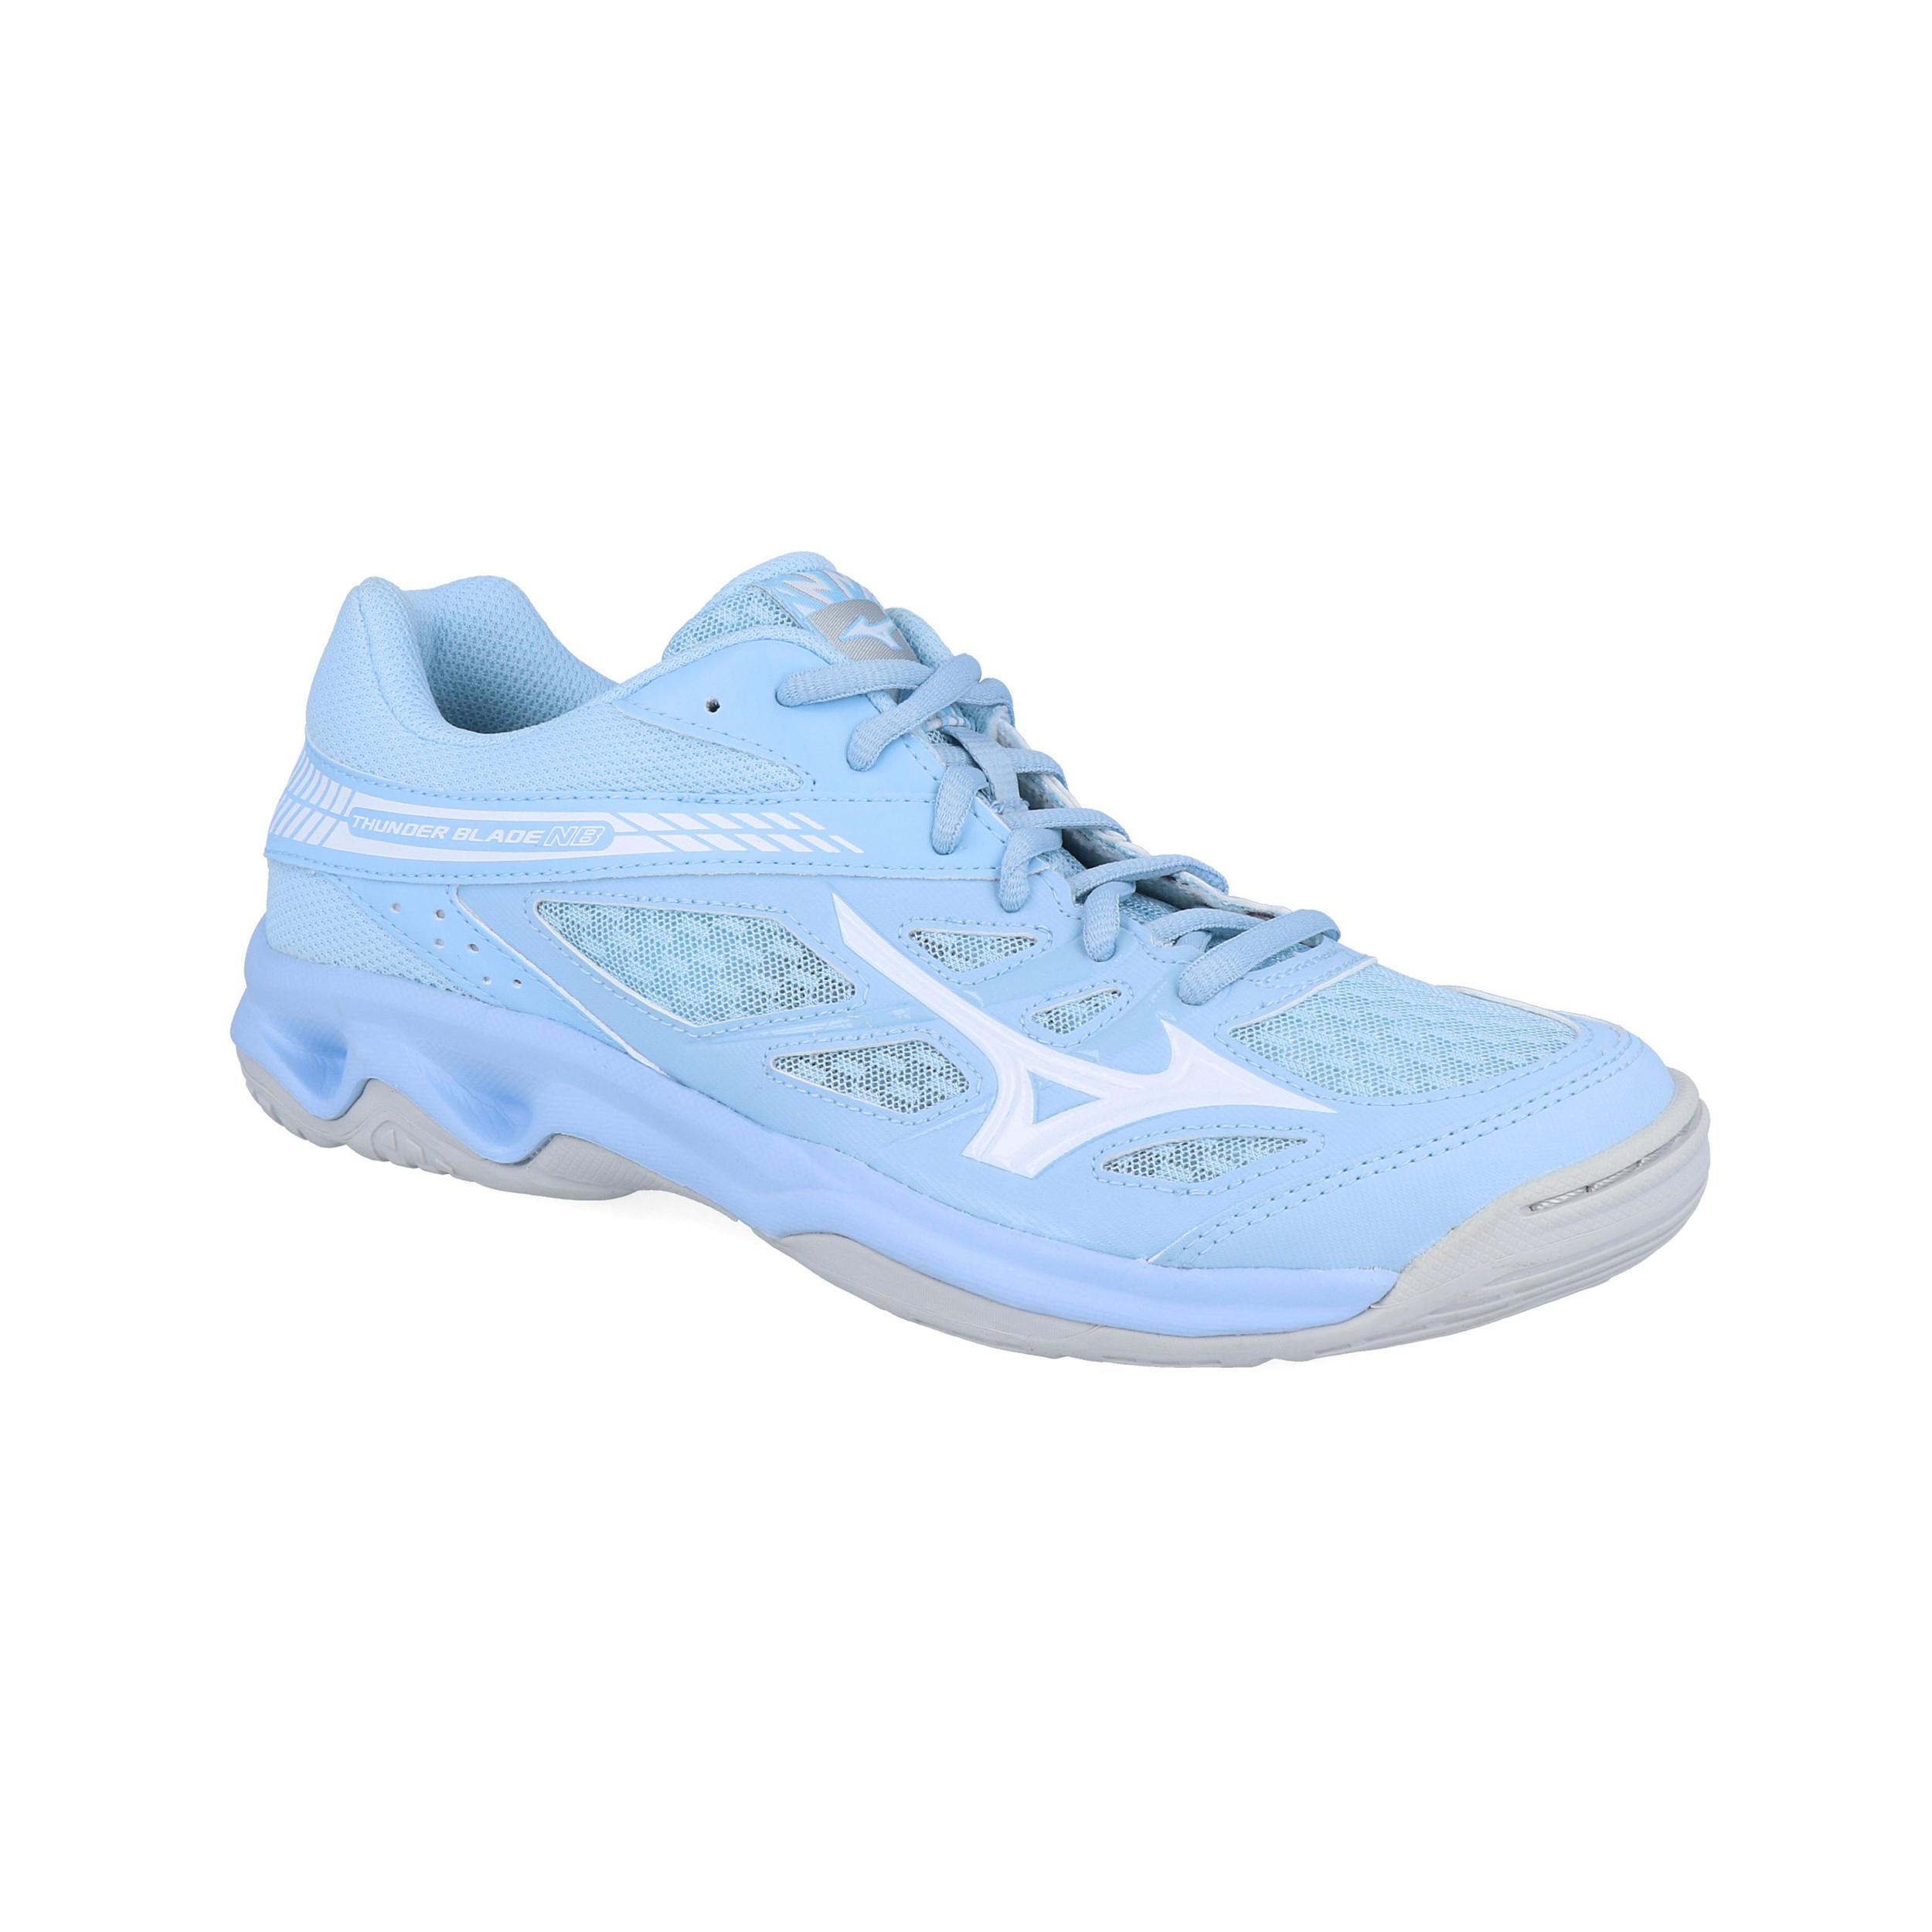 Détails sur Mizuno Femmes Thunder Blade Nb Chaussures De Sport En Salle Baskets Bleu